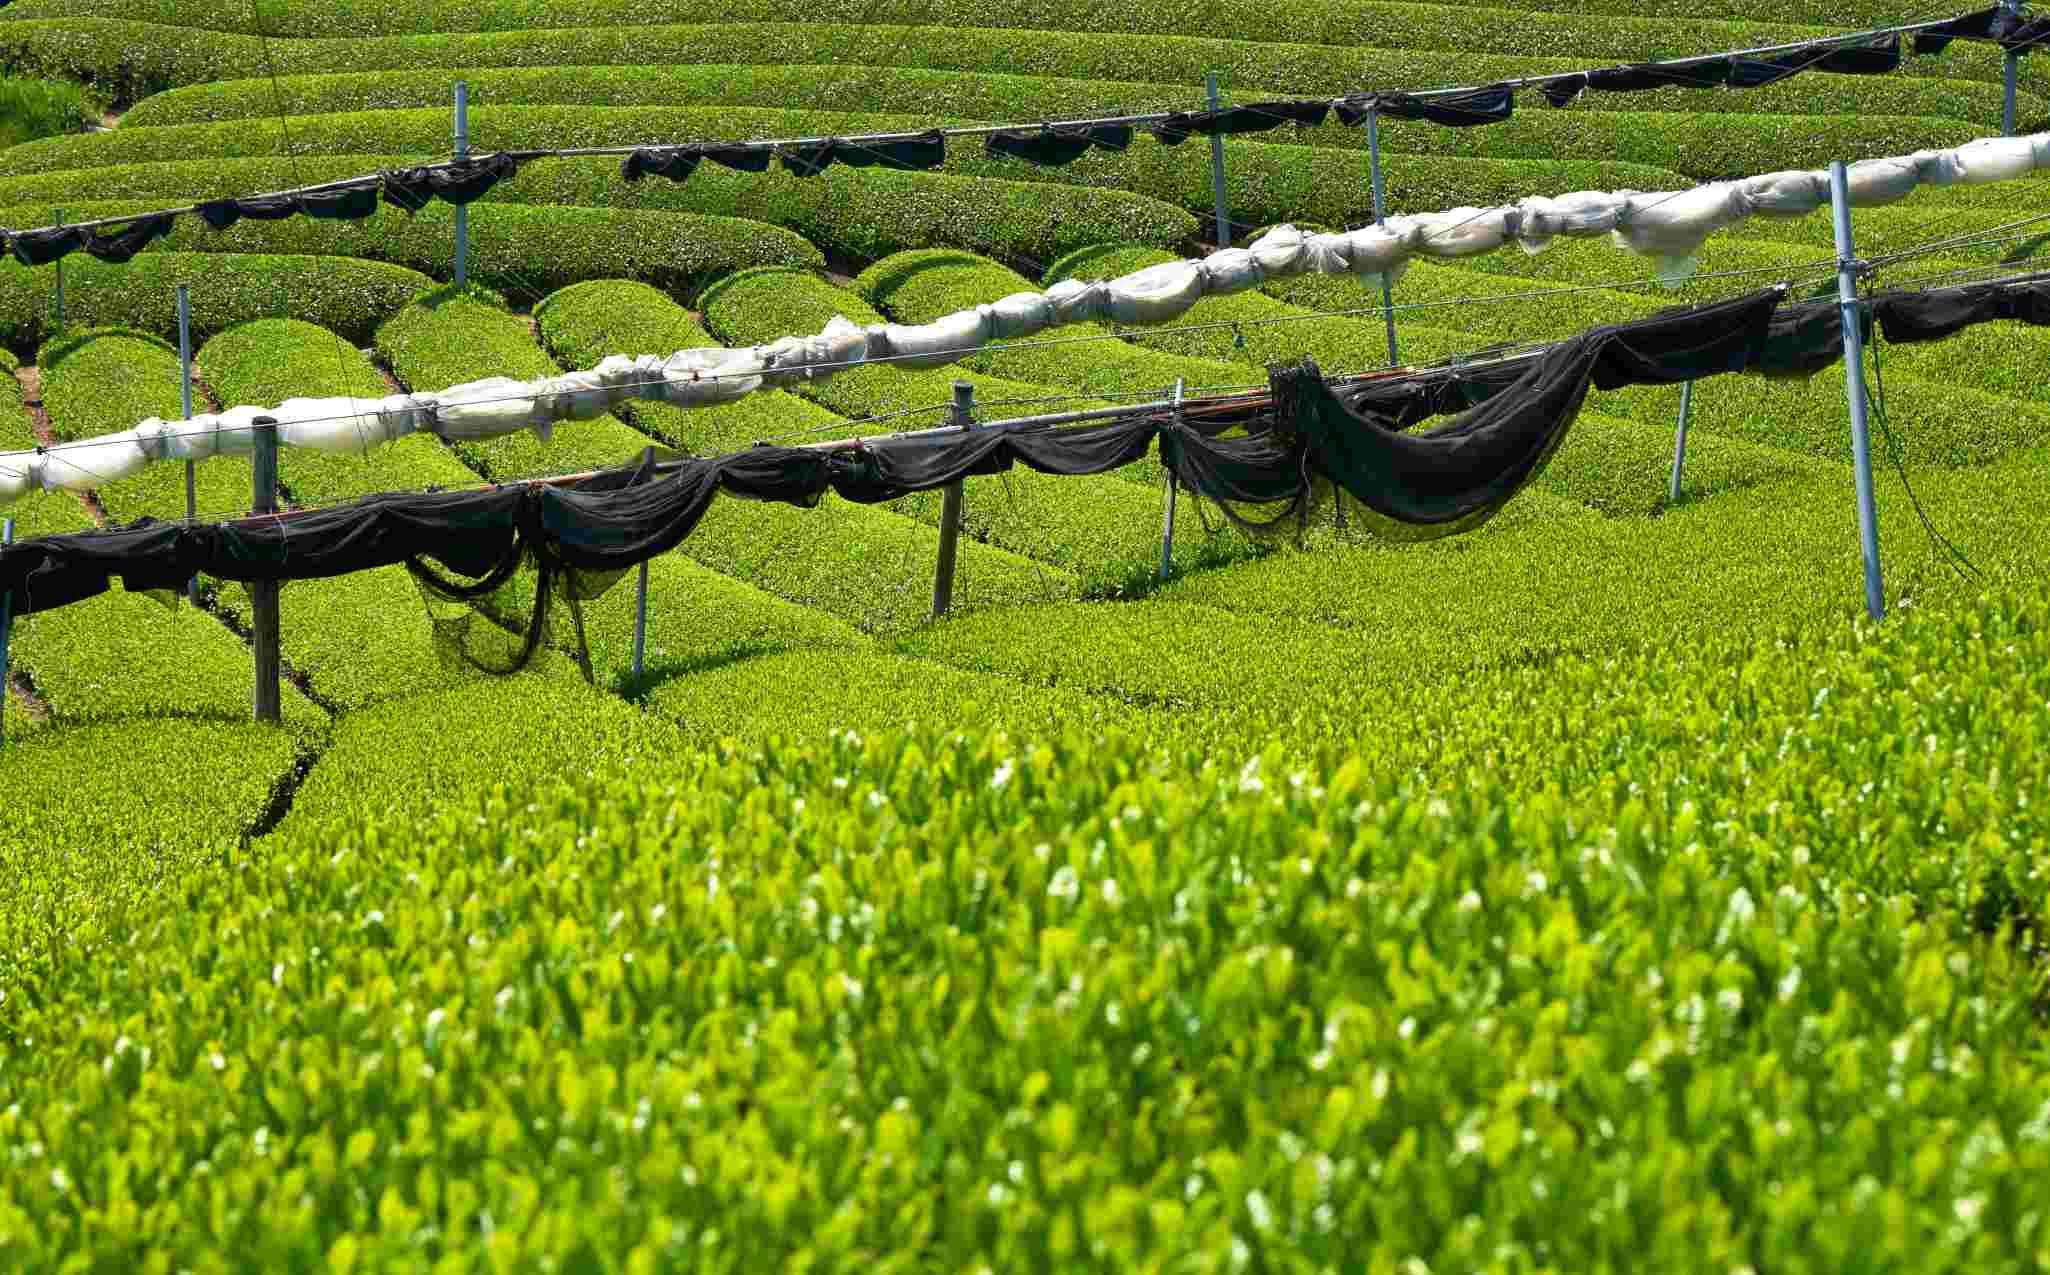 Uji Tea Plantation